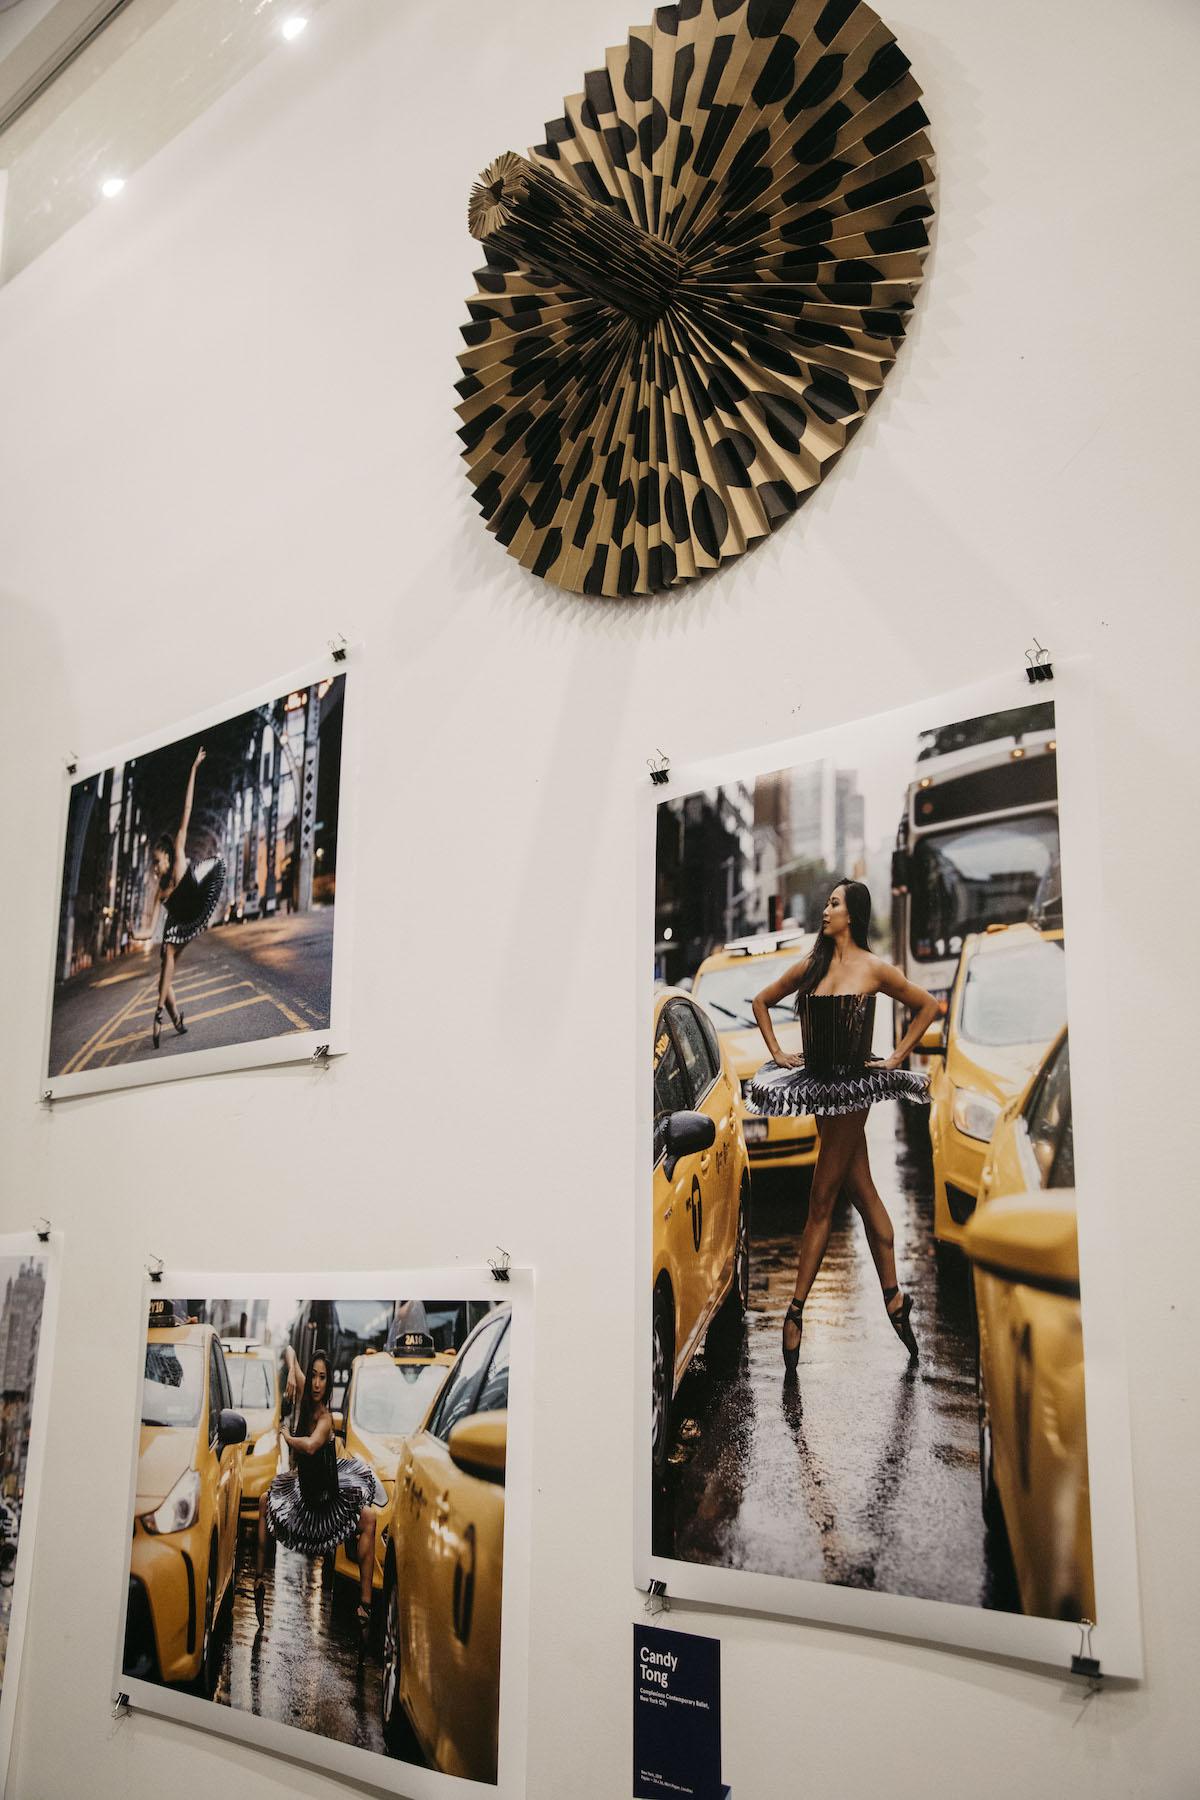 miss-cloudy-pauline-loctin-plie-project-melika-dez-ausgang-exhibition-paper-art-origami-ballerina-ballet-dancer-pointe-fold-6.JPG